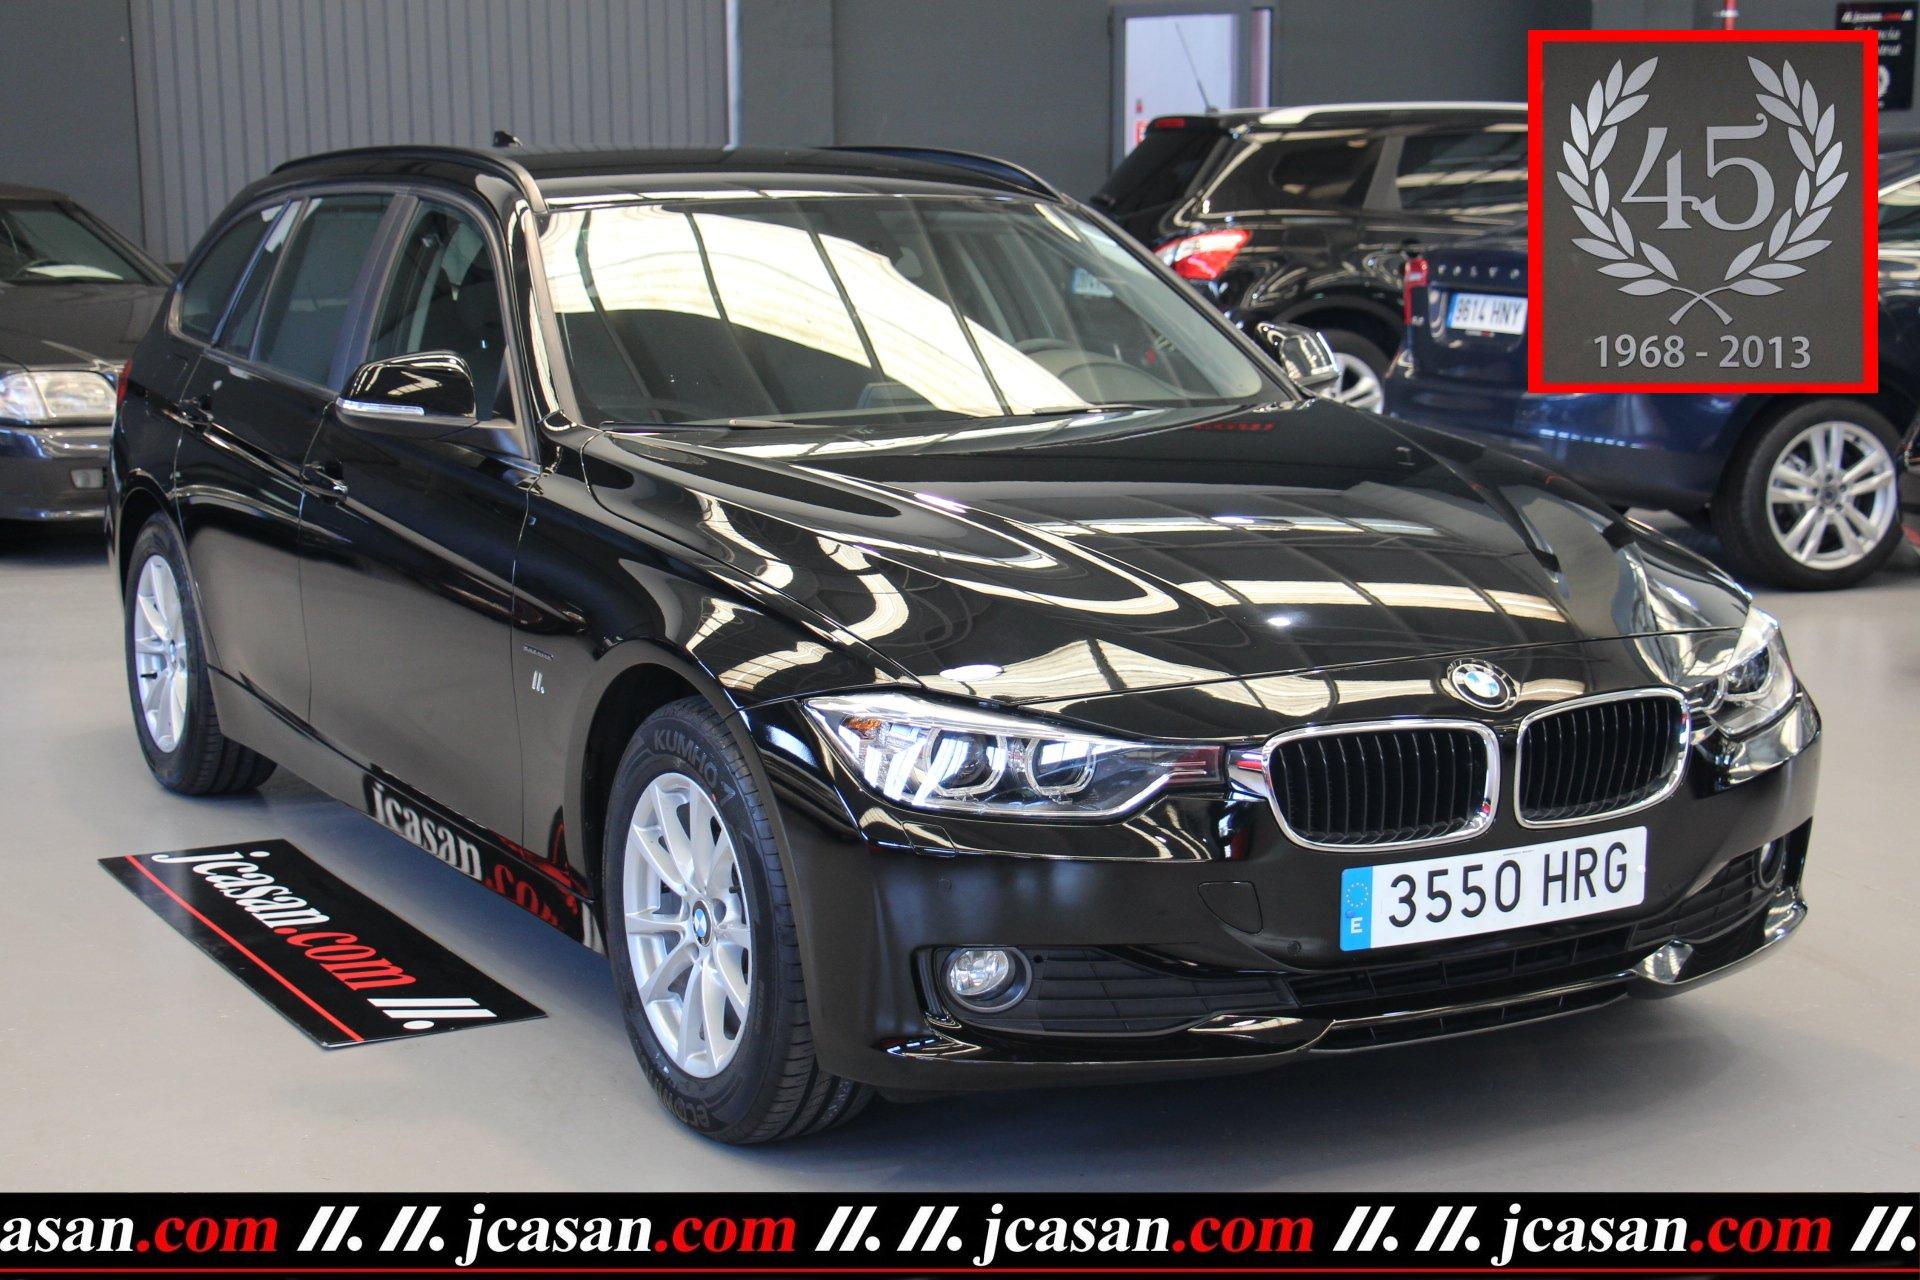 BMW 318d TOURING 143 CV 6 Vel Black Edition